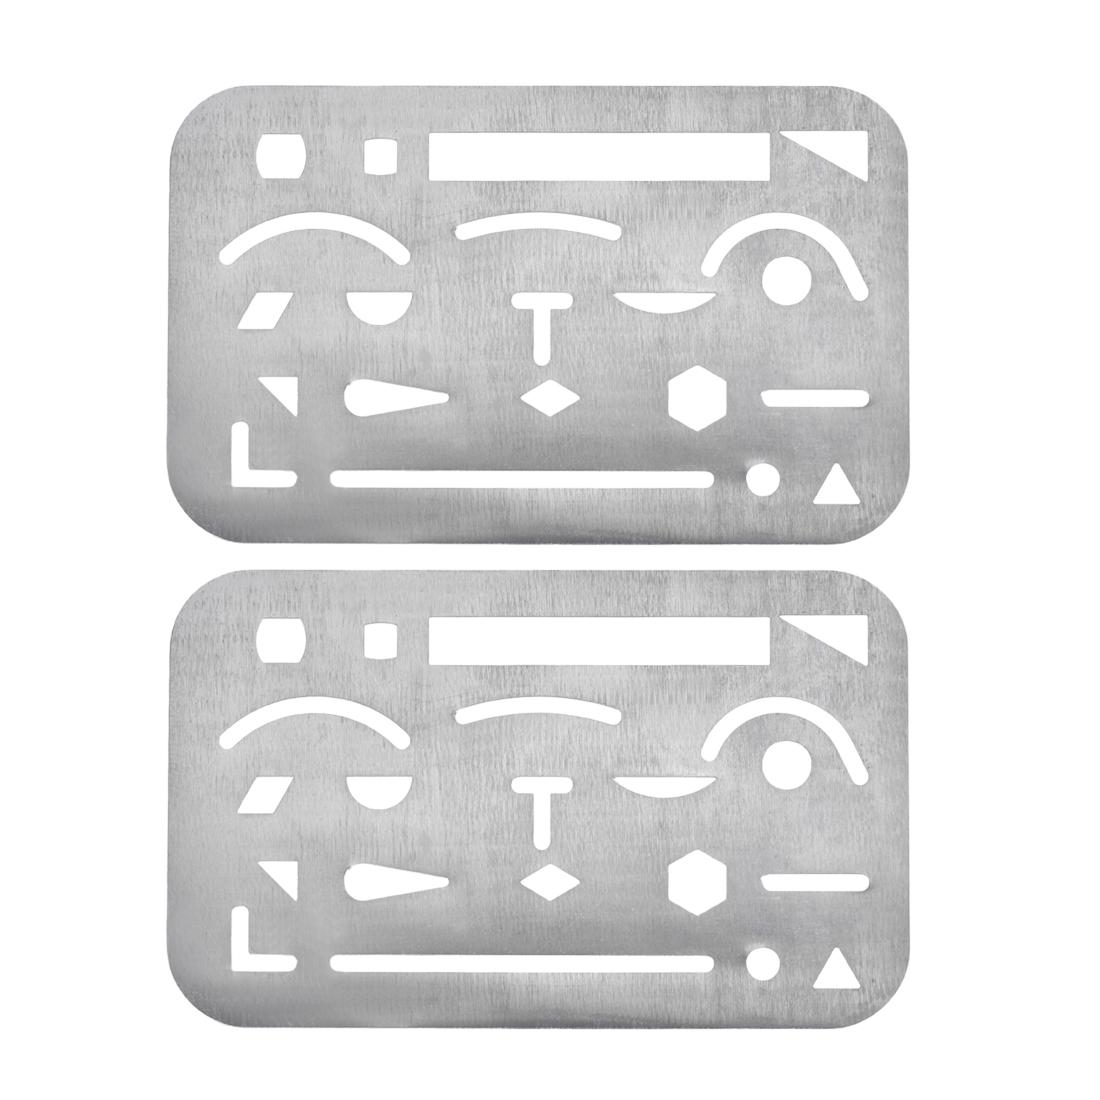 Erasing Shield 21 Patterns Stainless Steel Drawing Template 2pcs